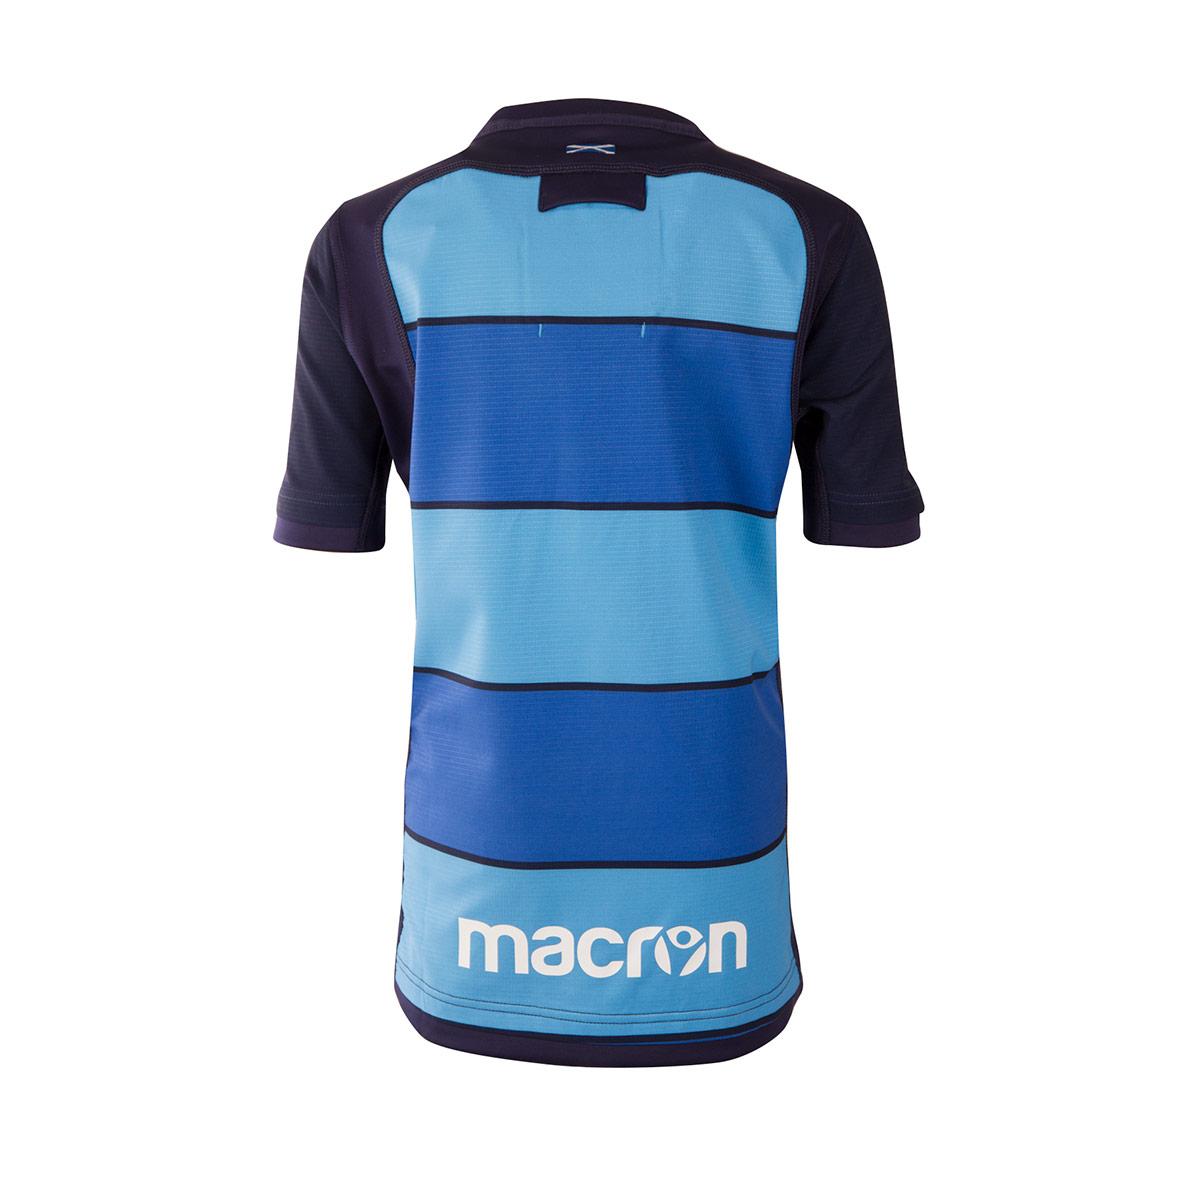 c33e31b72 2019 Kids Royal Scotland Training Shirt (Short Sleeved